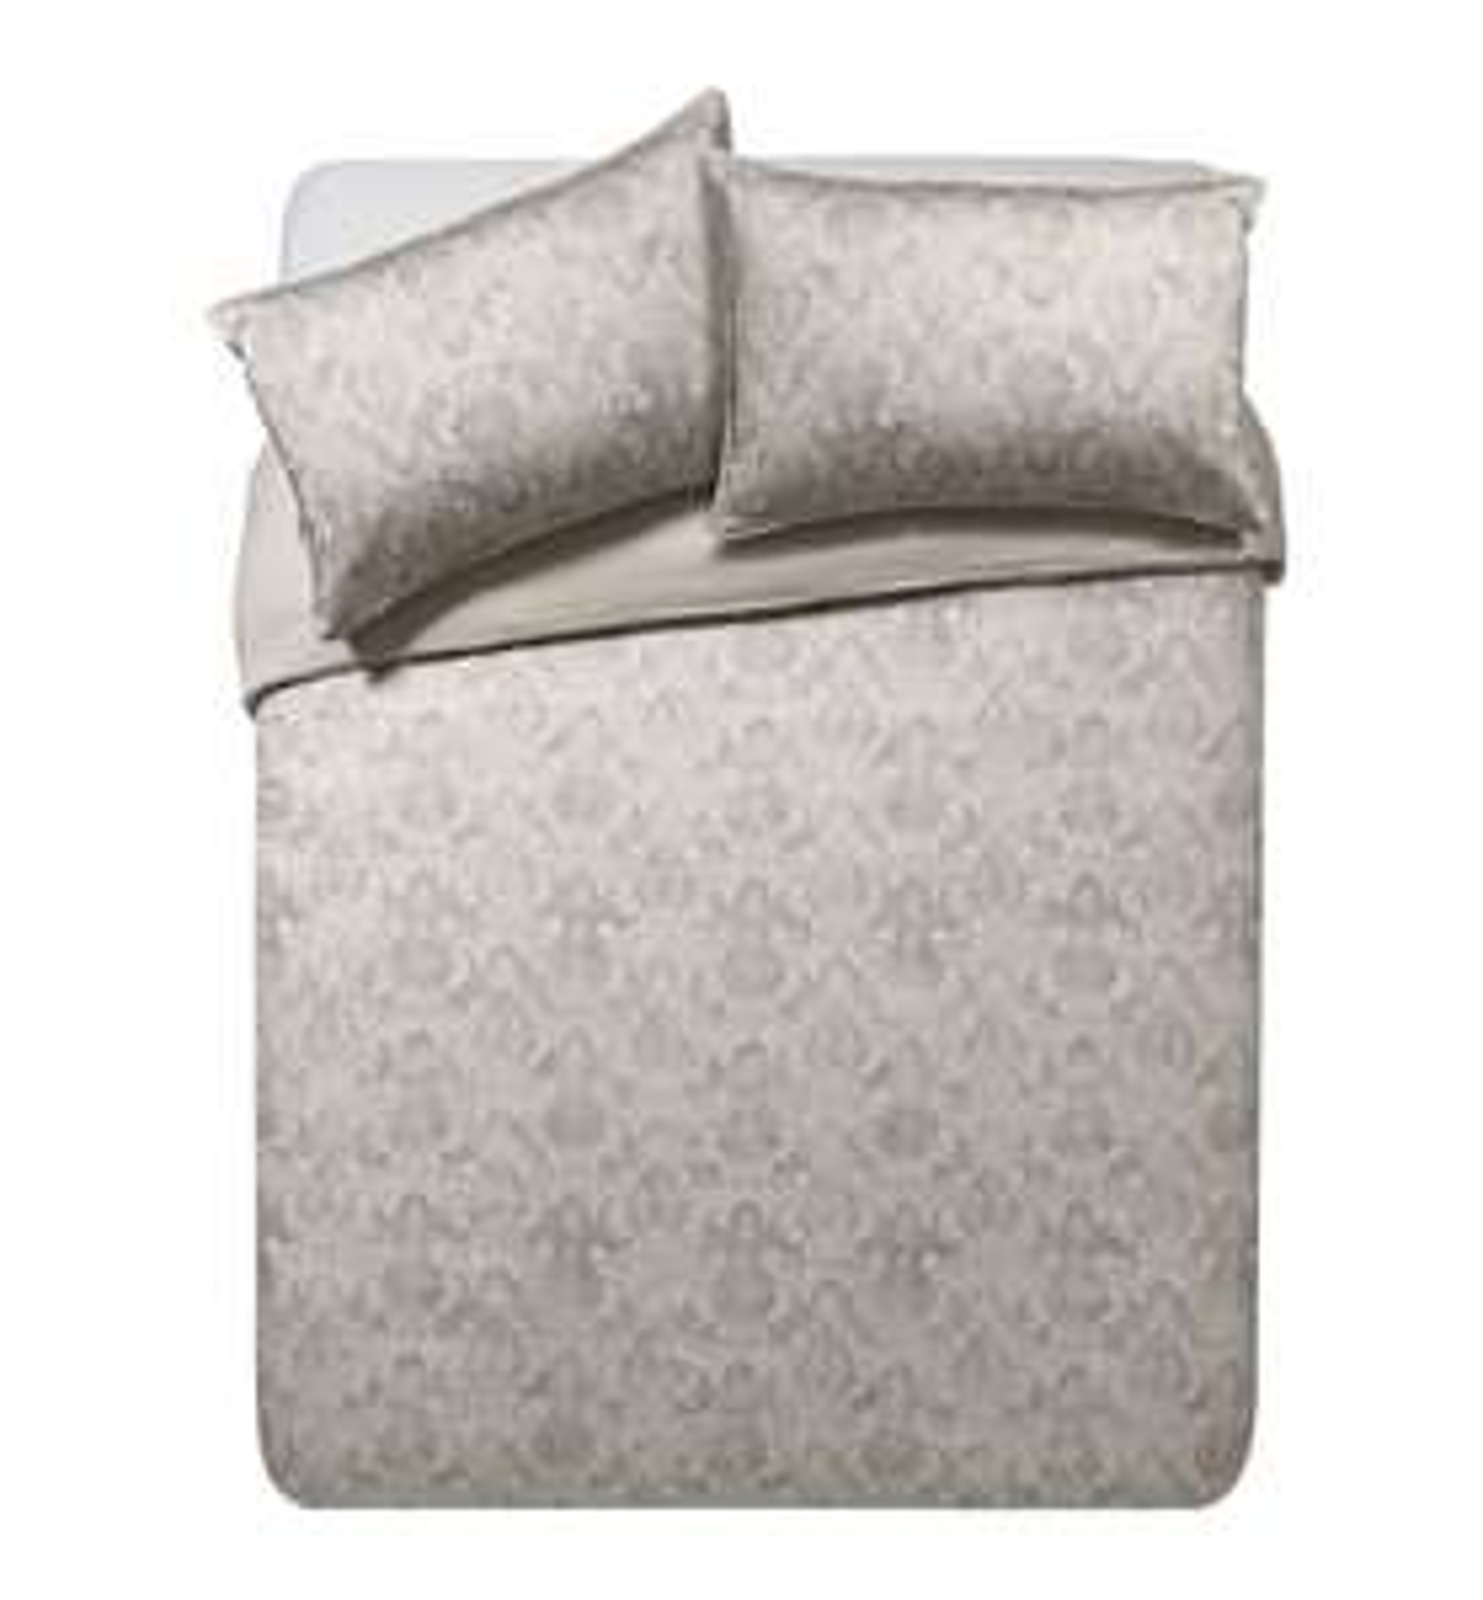 100% Cotton Percale Bedding Set - Double £15.99  Superking  £18.99  Delivered  Argos @ eBay